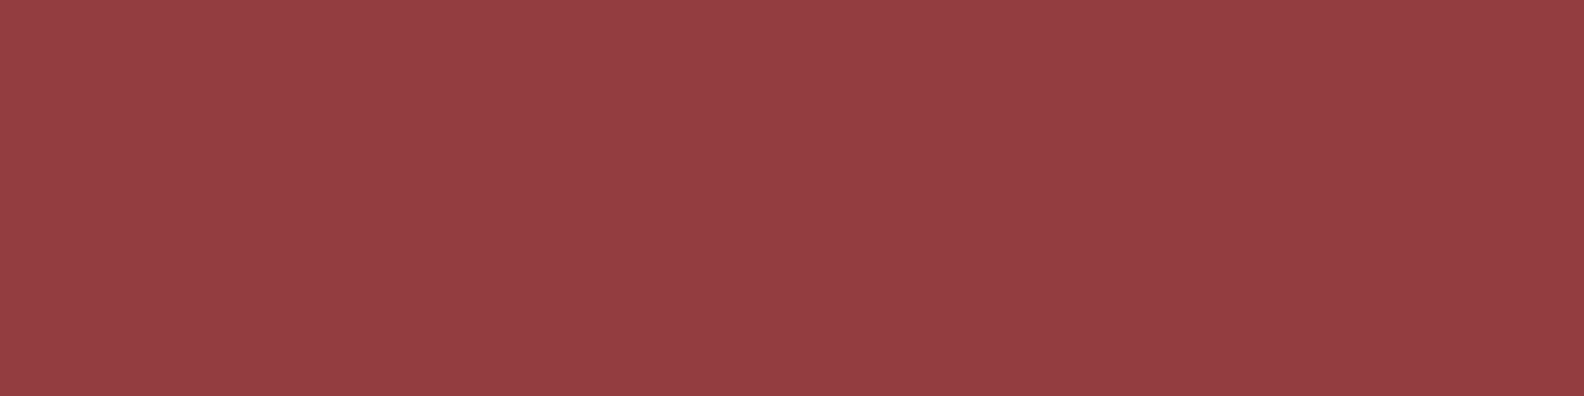 1584x396 Smokey Topaz Solid Color Background